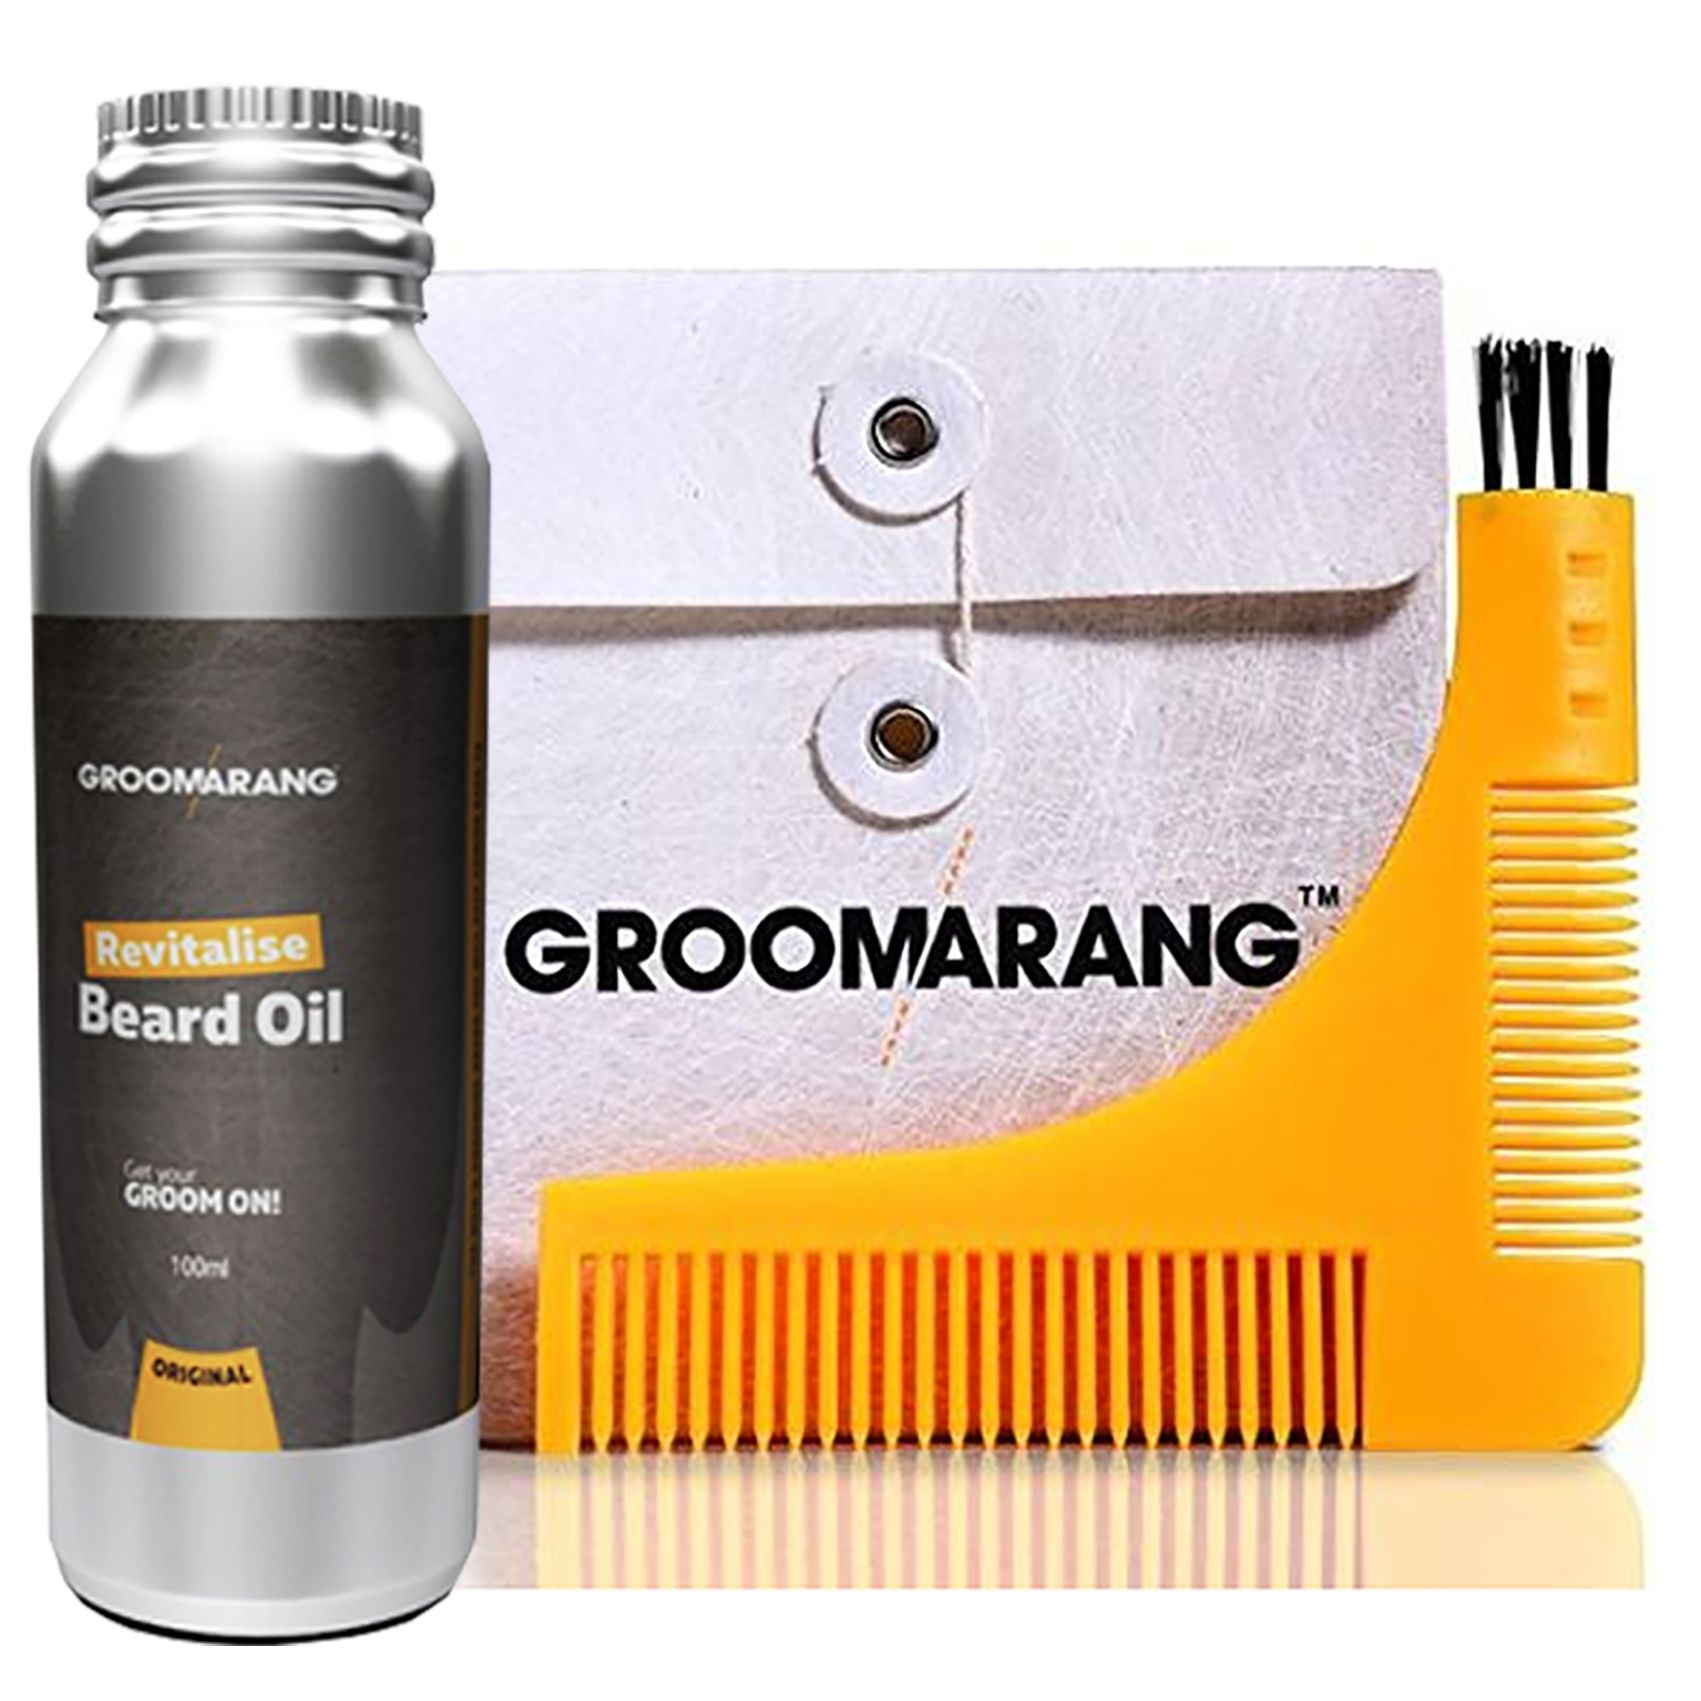 Groomarang Beard Comb & Beard Oil gift set, now available